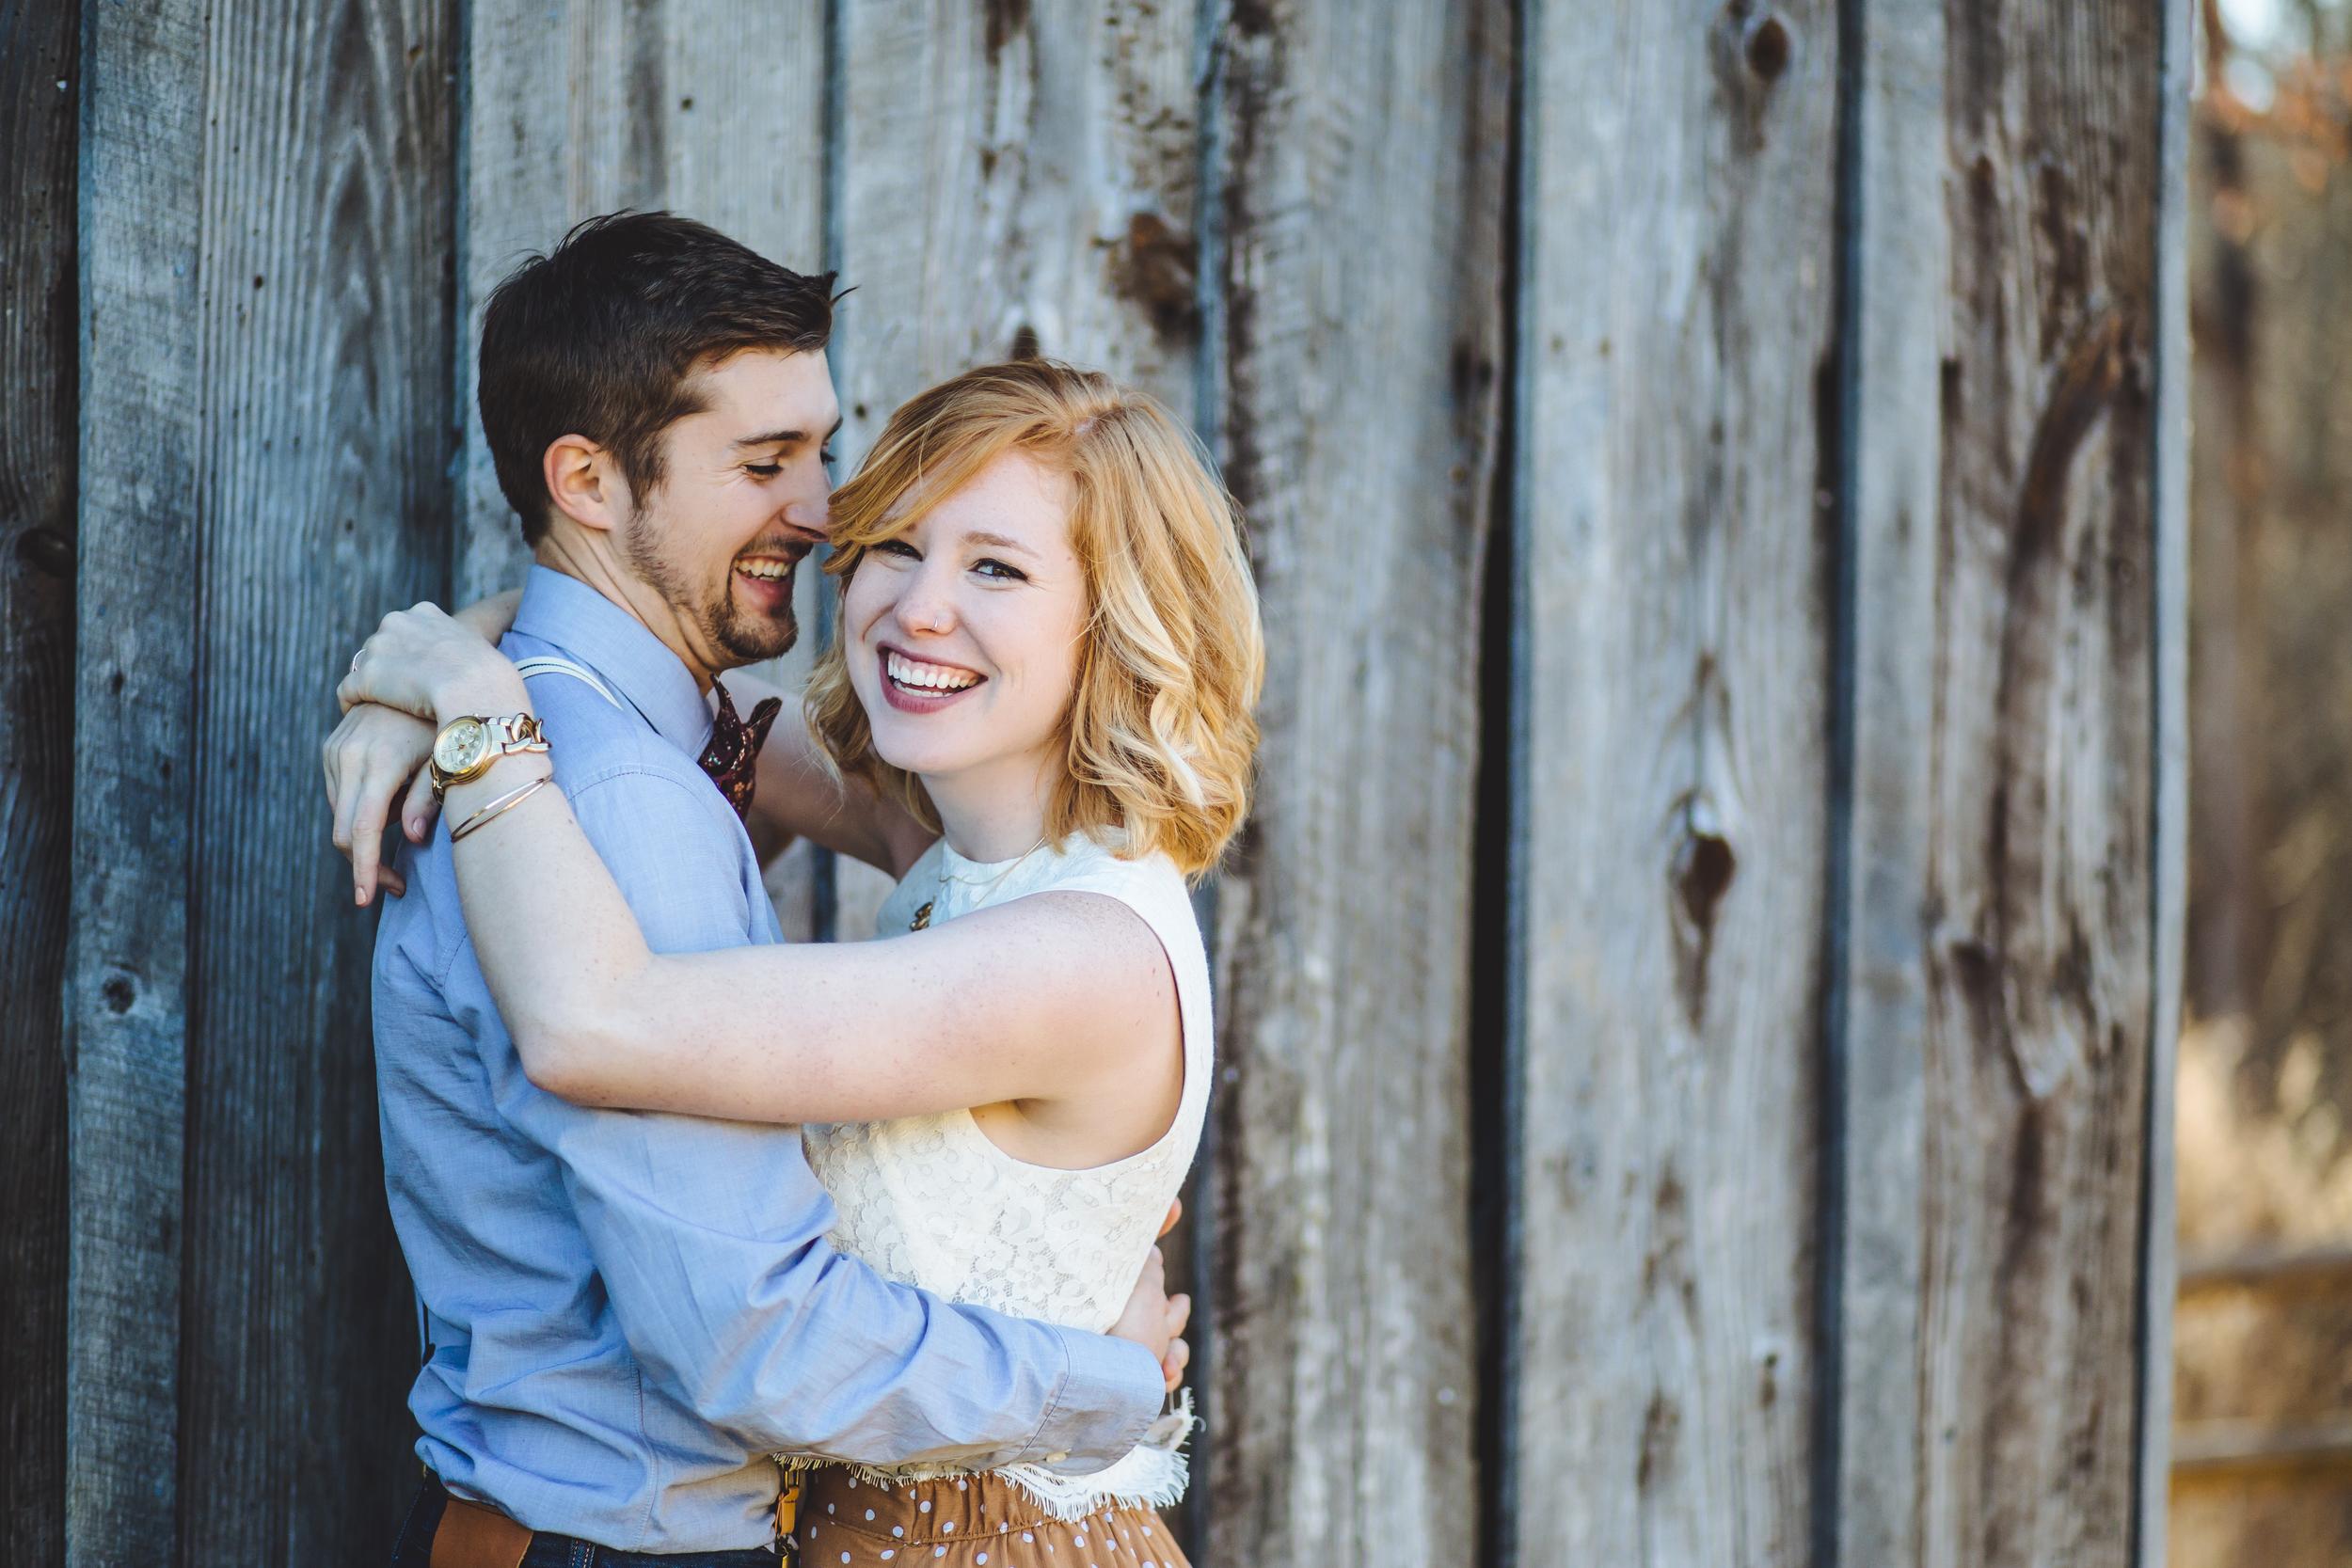 Nashville weddings, Atlanta weddings, Atlanta wedding planner, Atlanta wedding coordinator, Nashville wedding planner, Nashville wedding coordinator, covenant, marriage